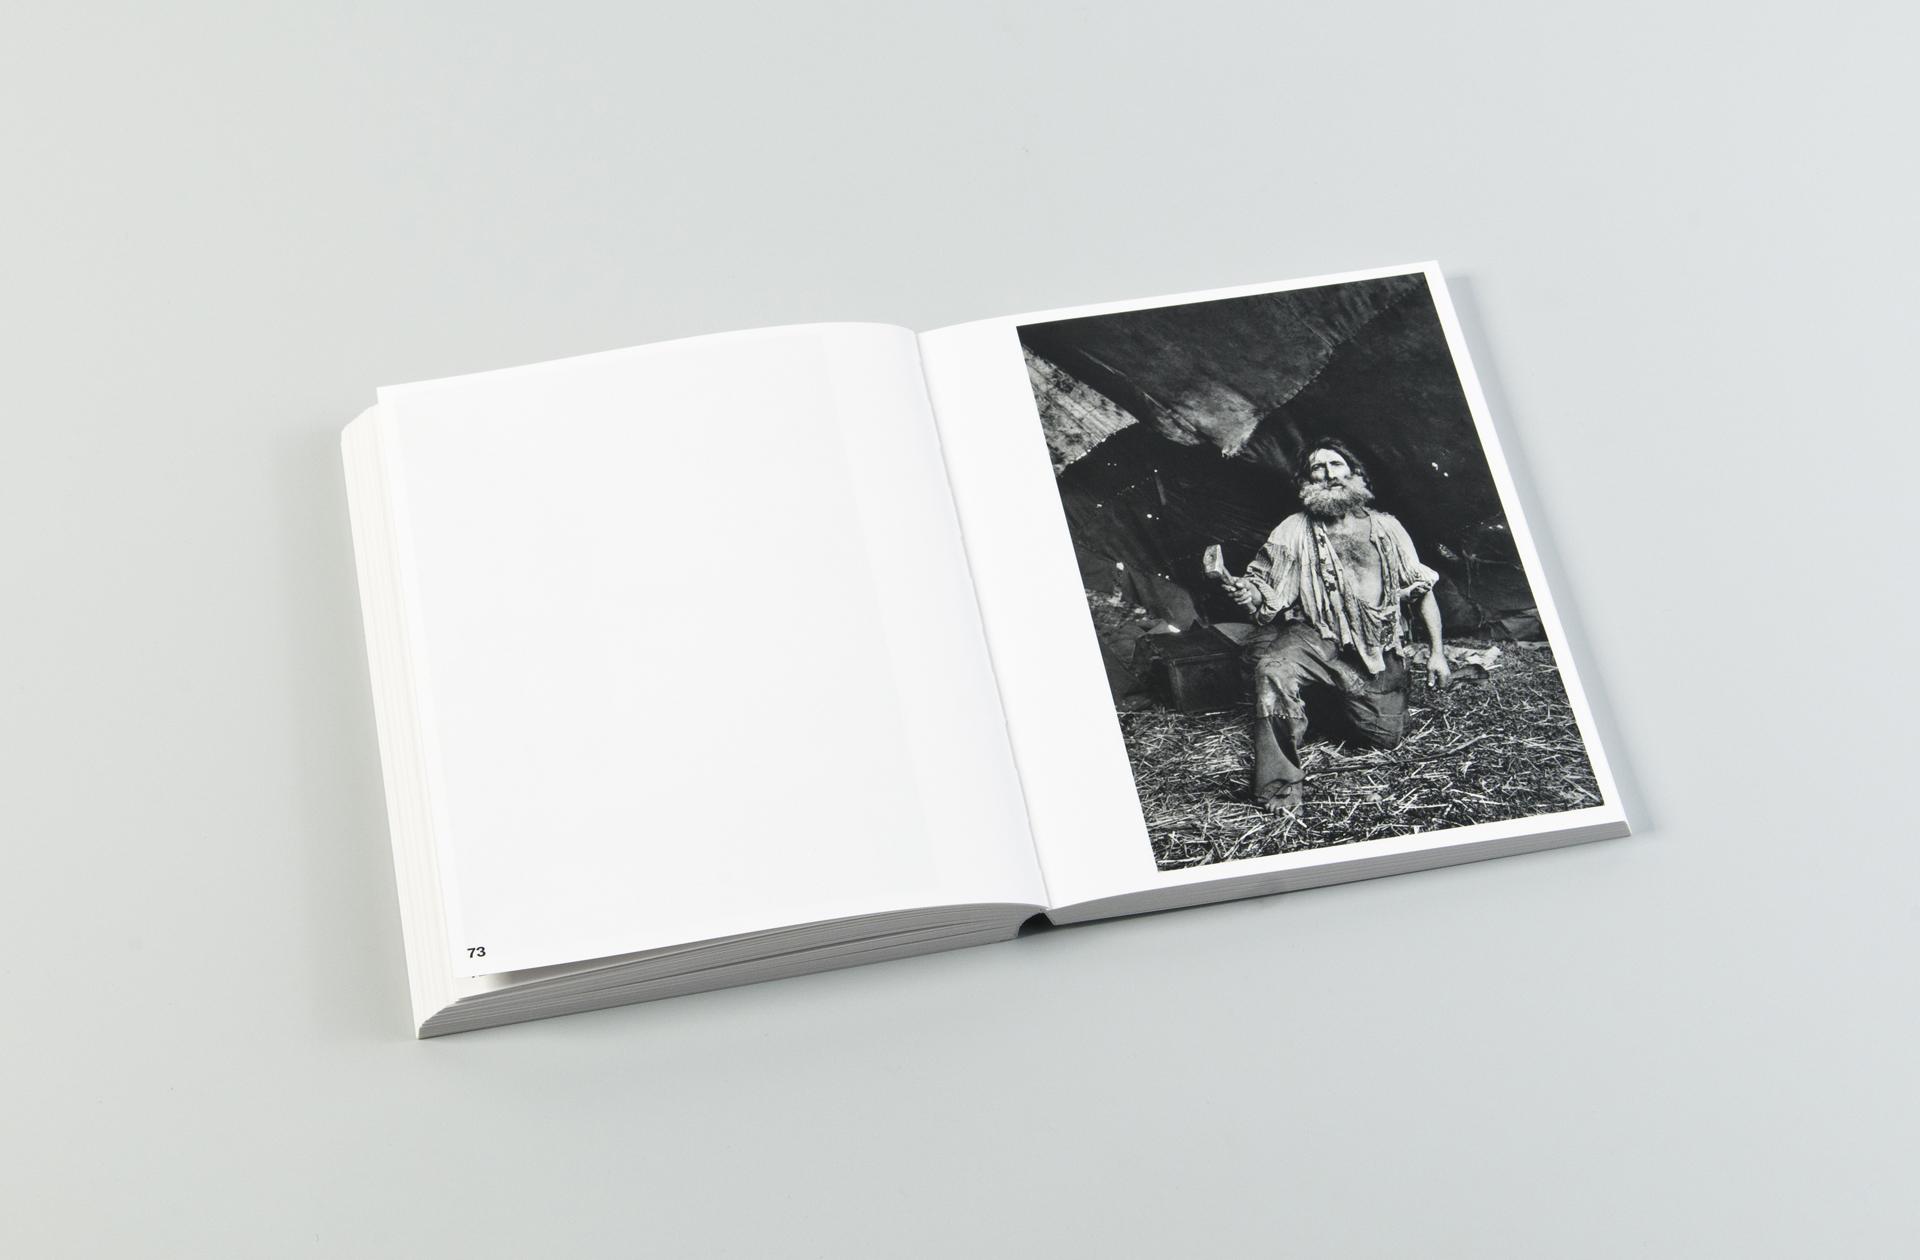 delpire-KOUDELKA-josef-gitans-2